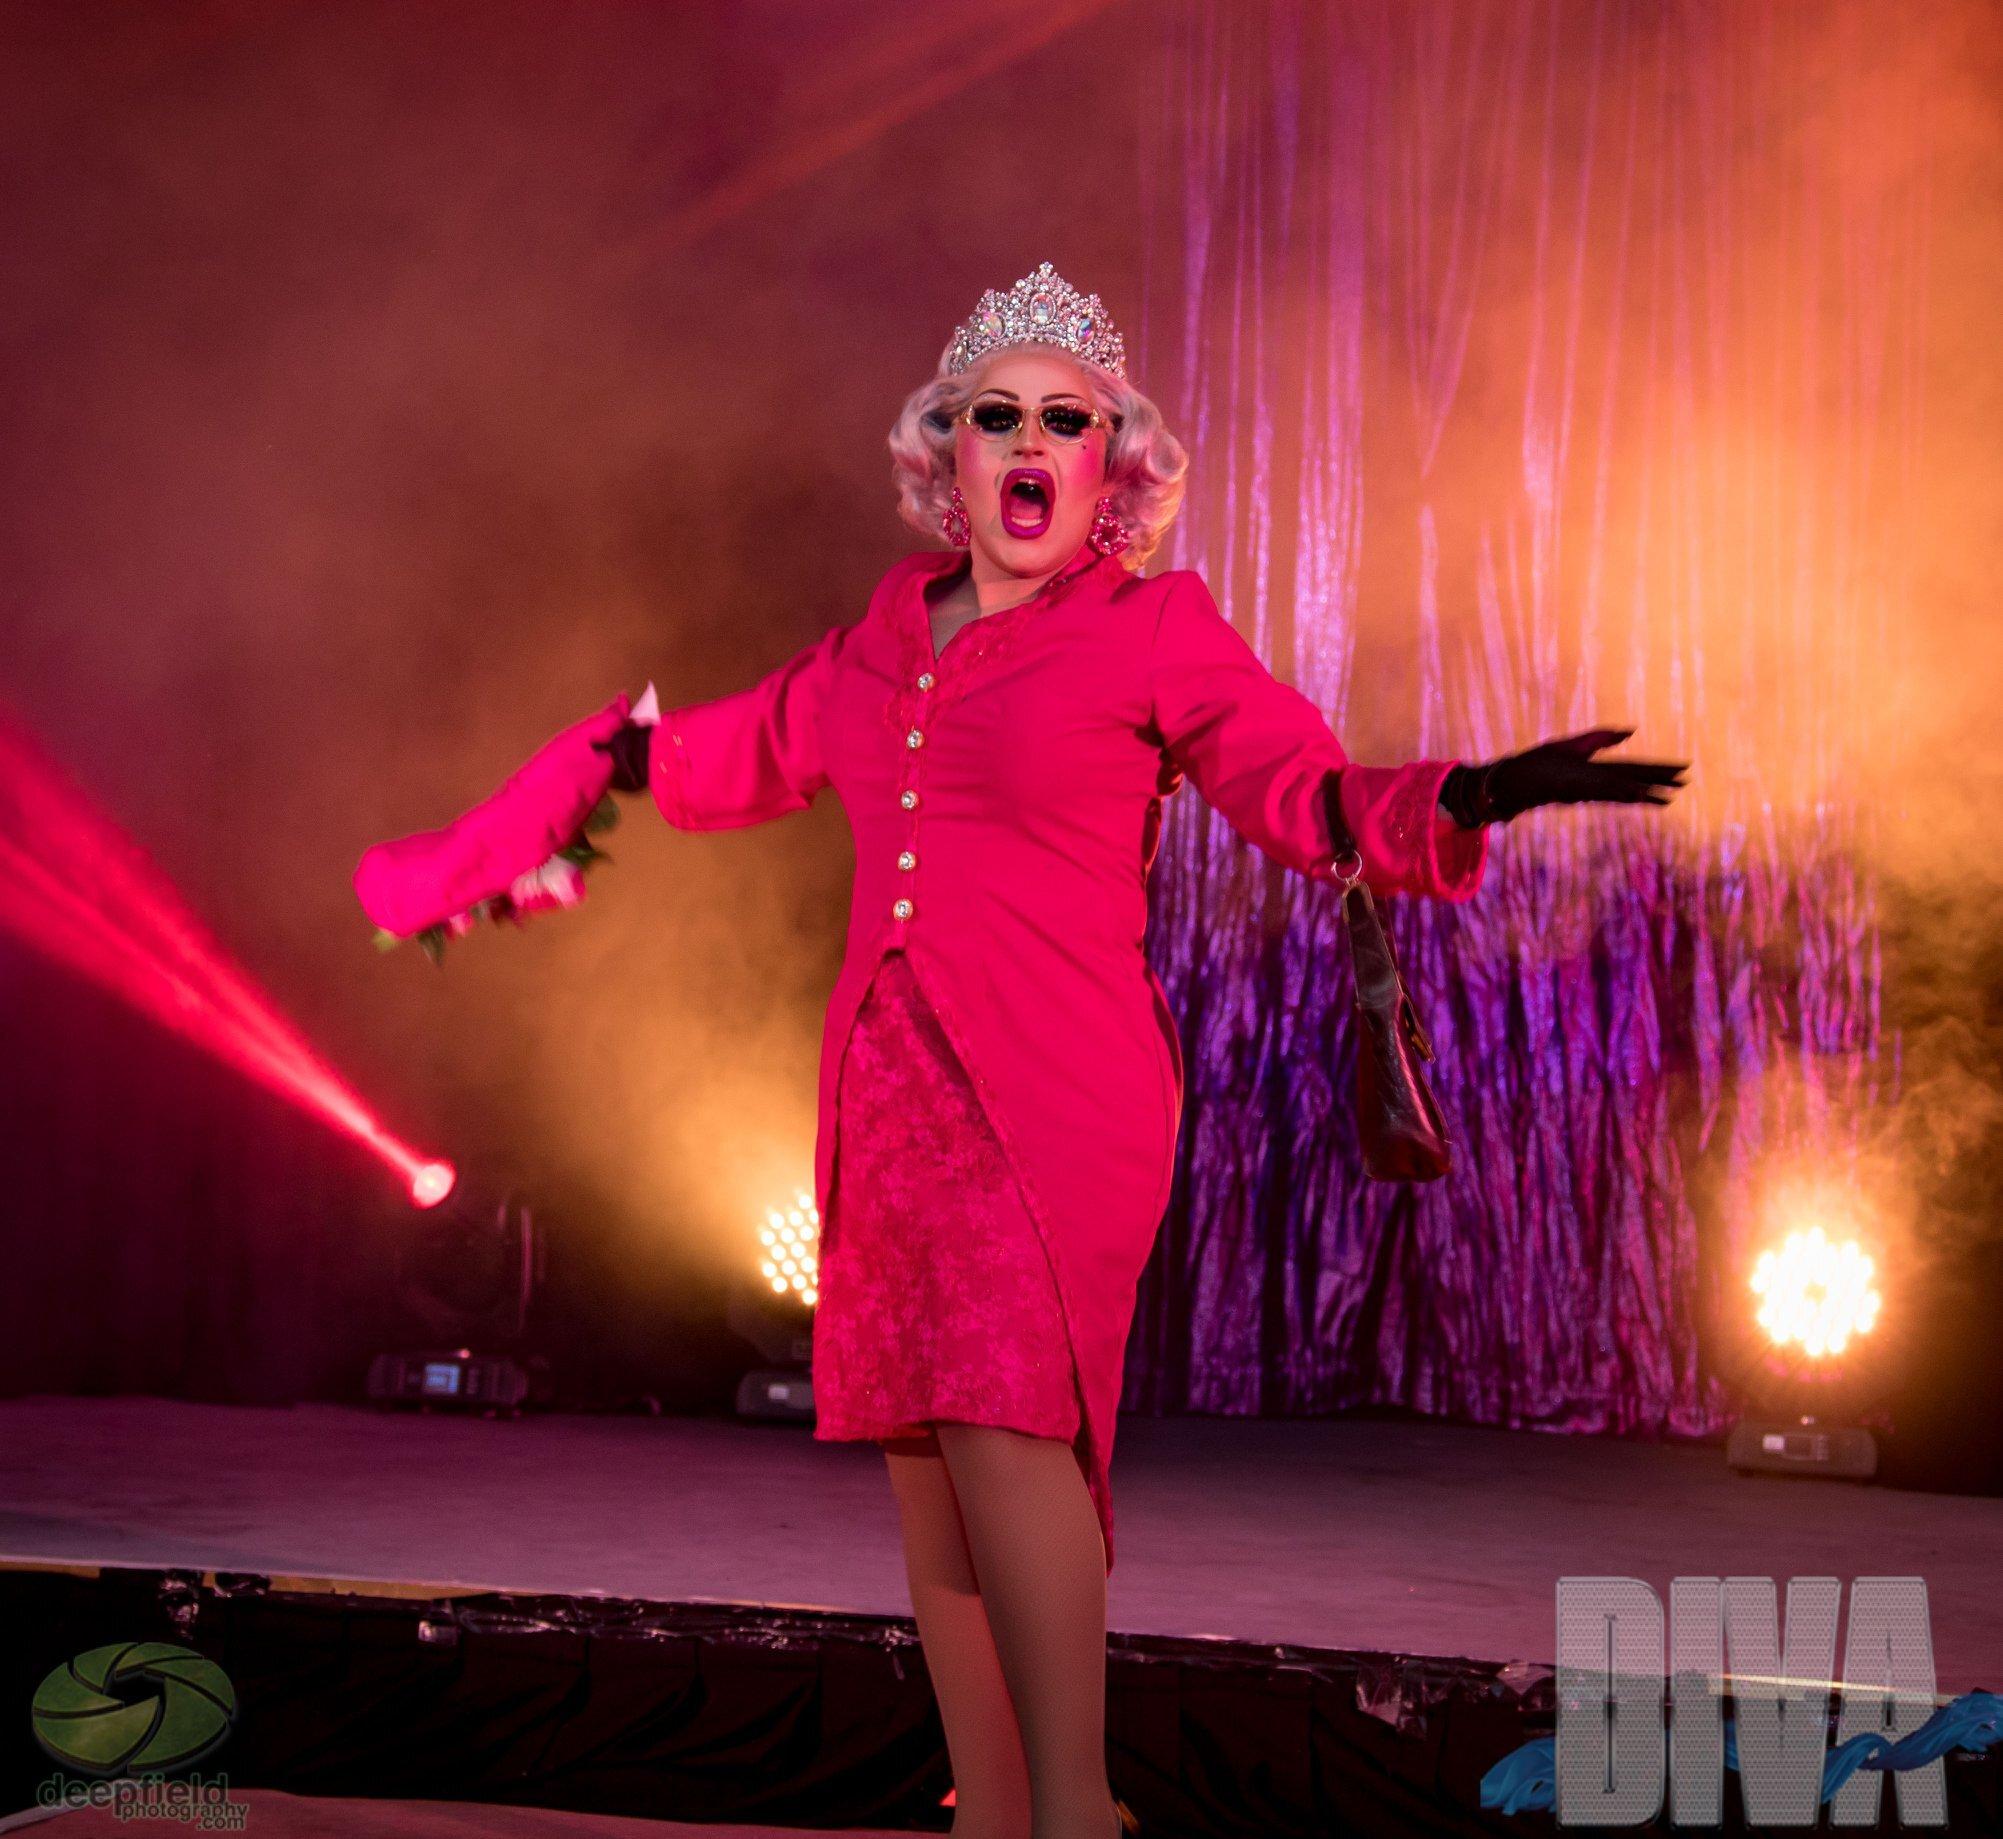 hannah-conda--queen-elizabeth-second-uk-diva-awards-sydney-drag-queen-royalty-best-hire-drag-race-australia-1.jpg